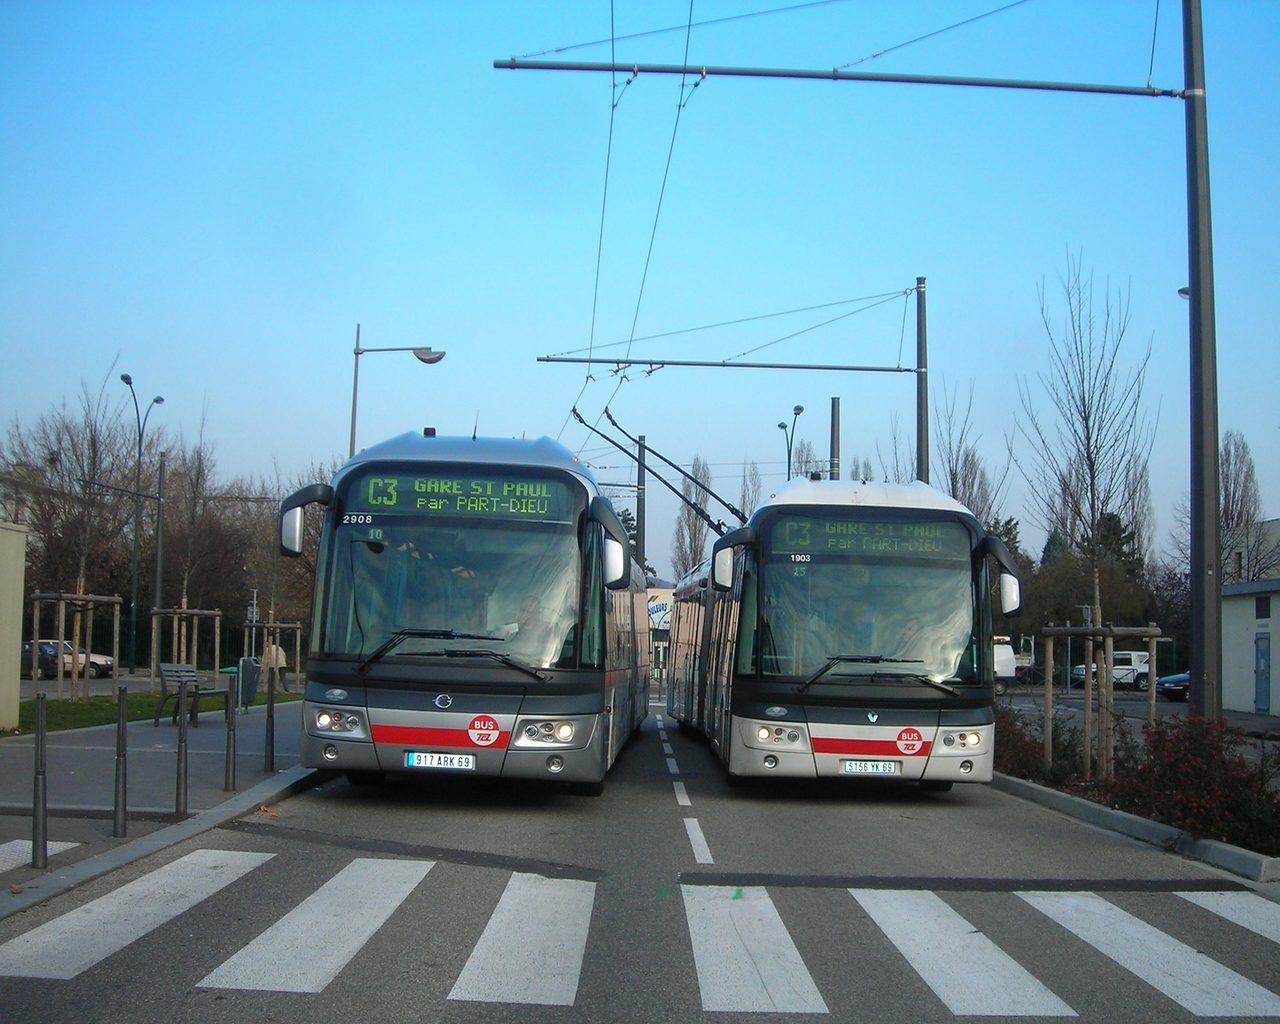 Transport en commun lyon - Horaire tram lyon ...